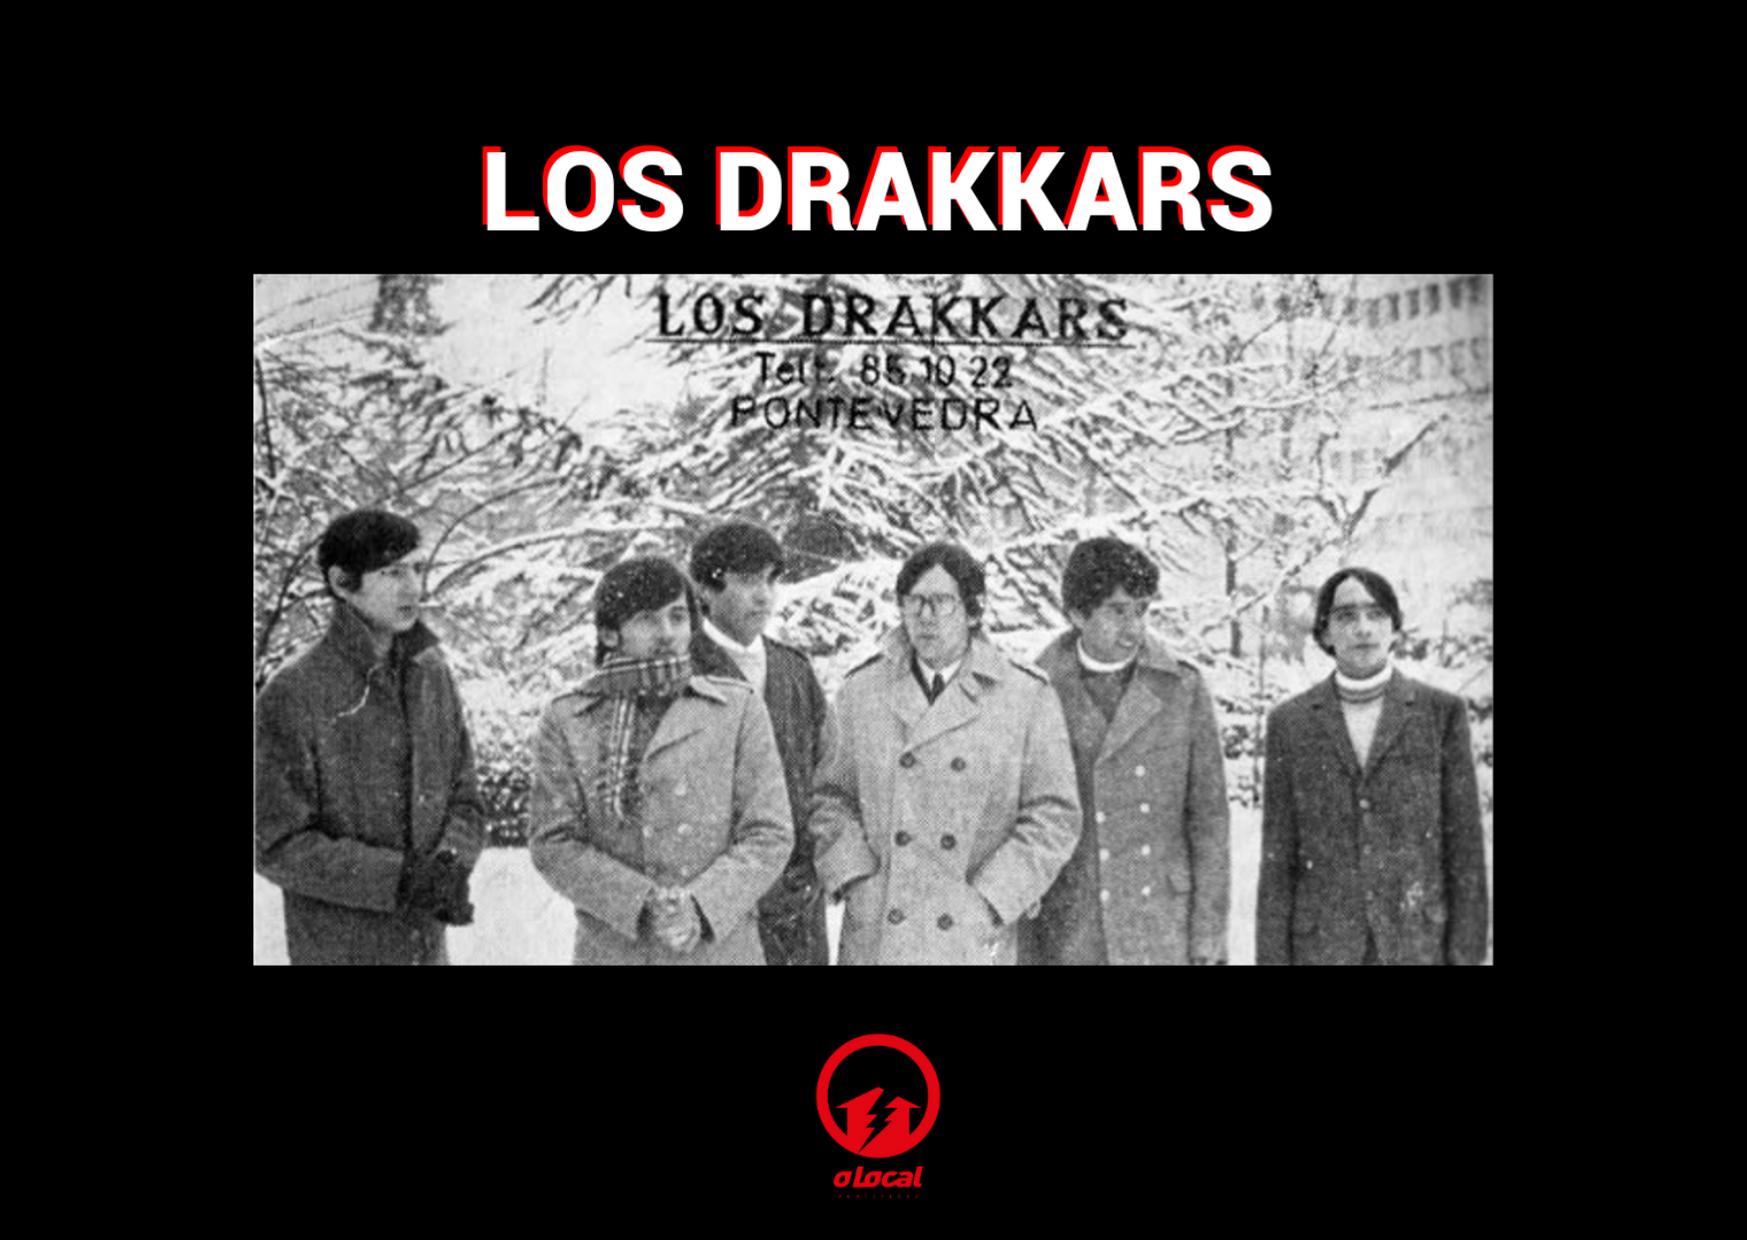 CLASE DE HISTORIA 11: LOS DRAKKARS